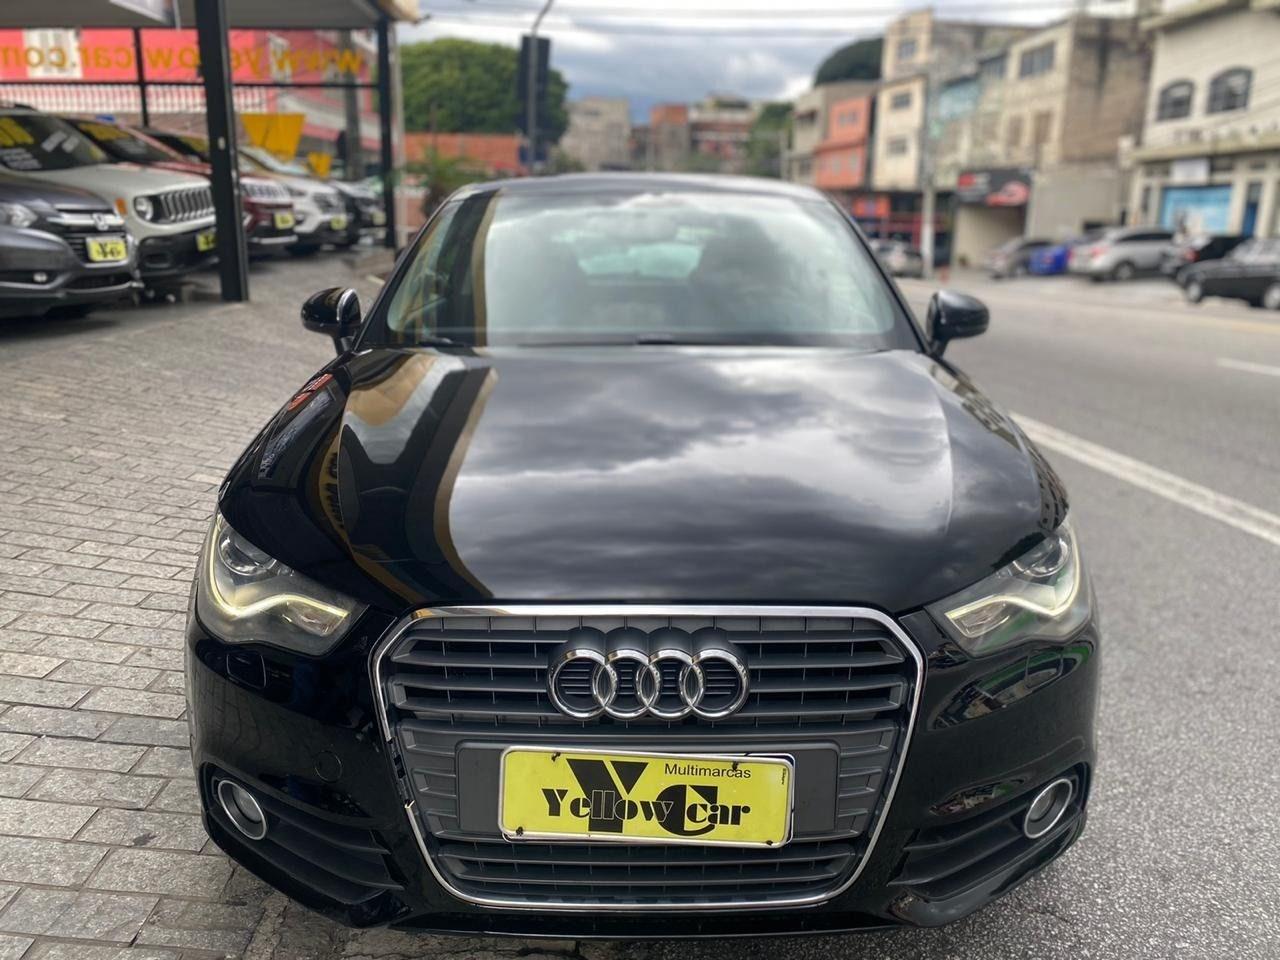 //www.autoline.com.br/carro/audi/a1-14-tfsi-attraction-16v-gasolina-2p-s-tronic/2011/sao-paulo-sp/13314028